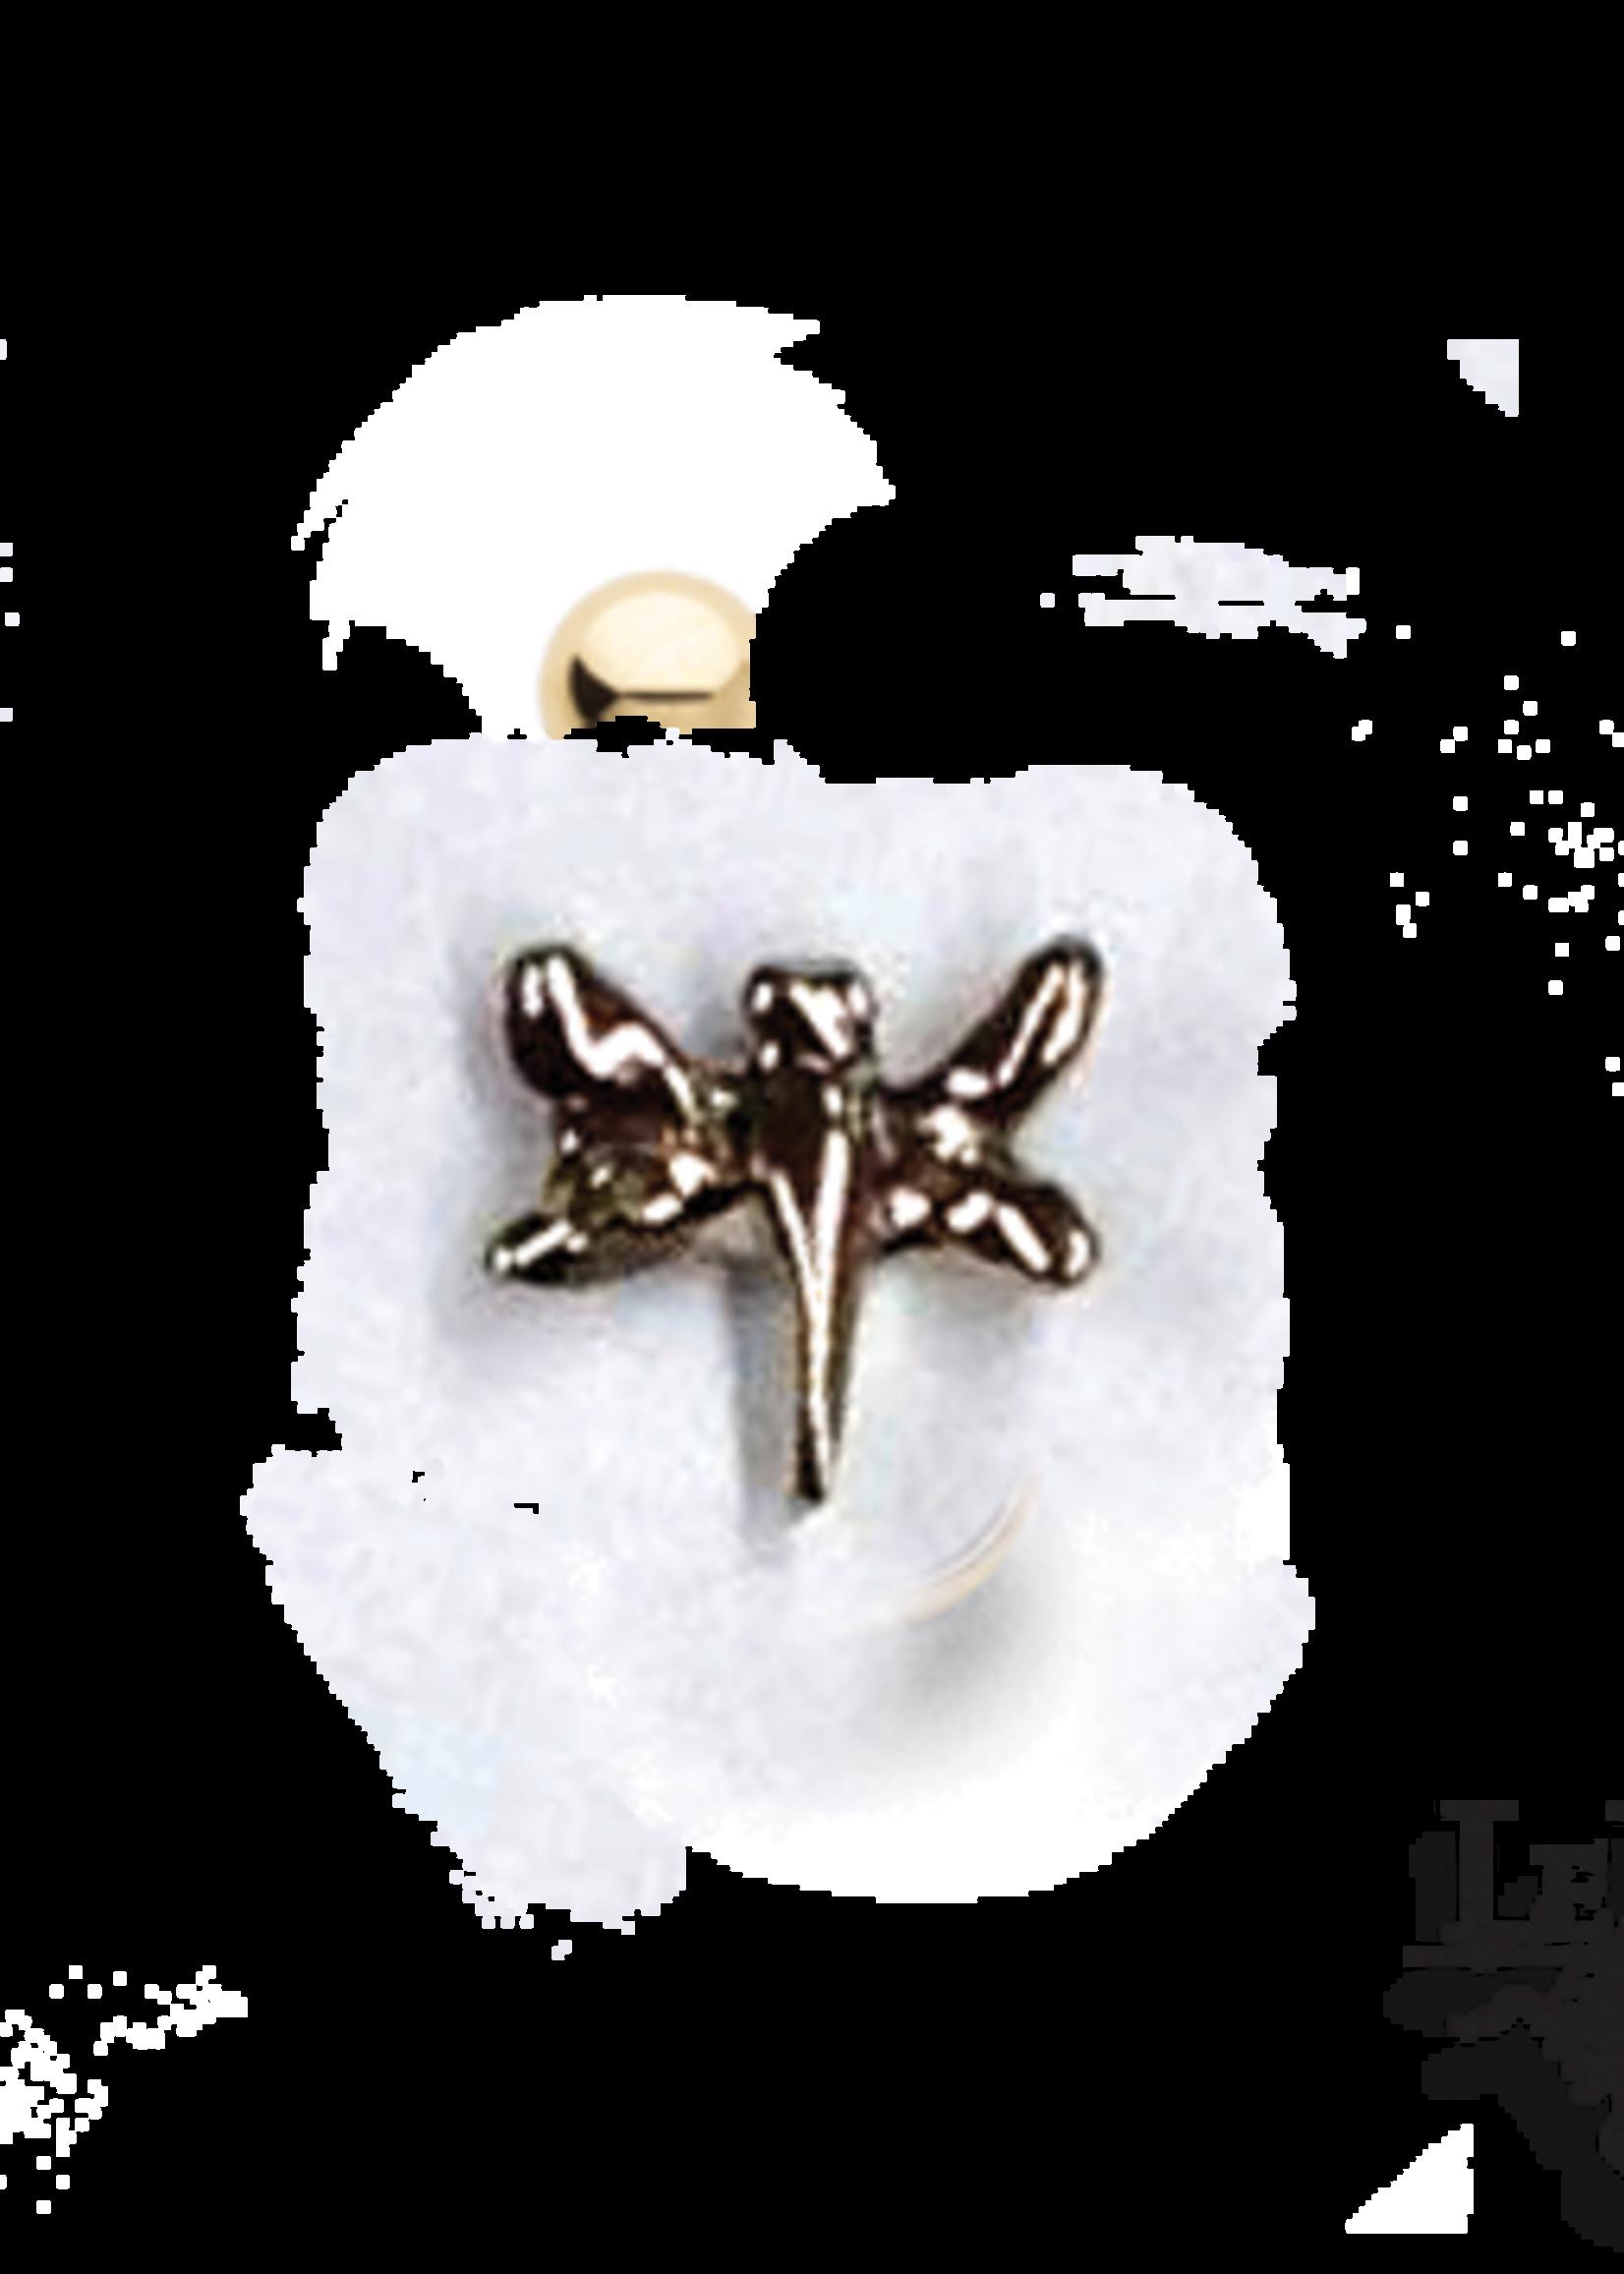 14k RG SM Dragonfly (3.5) Threadless Pin